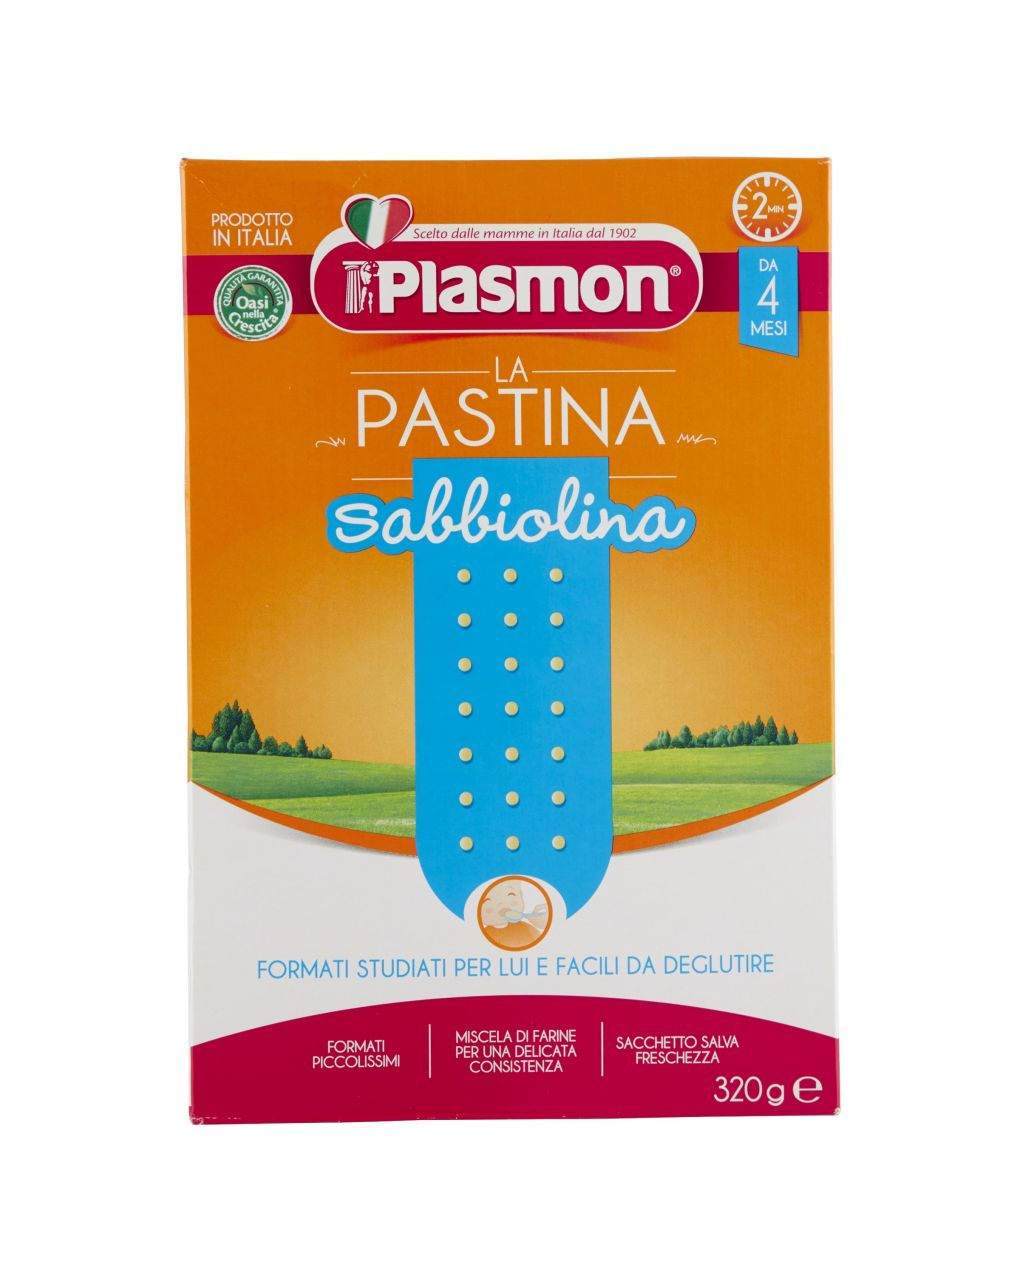 Plasmon - pastina primi mesi sabbiolina 320g - Plasmon